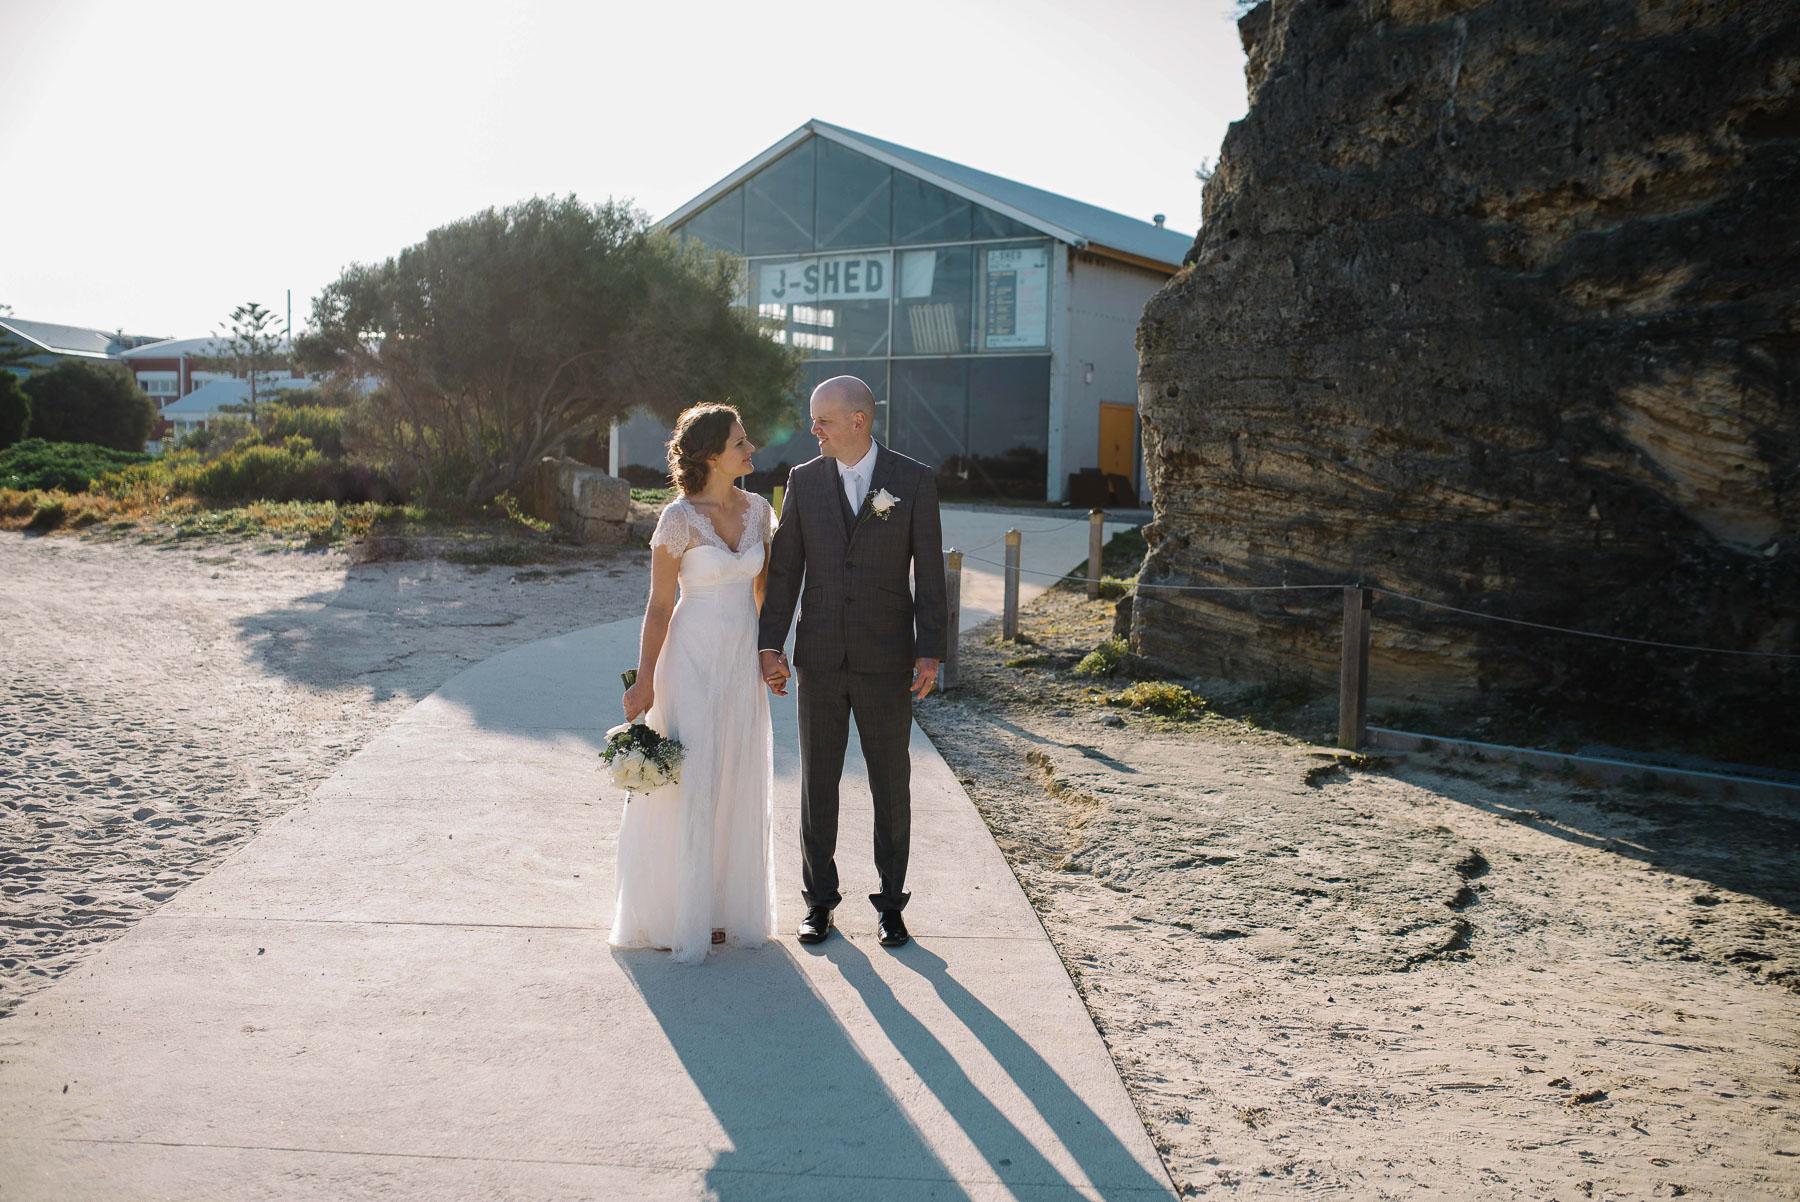 54-fremantle wedding photographer amanda afton.jpg